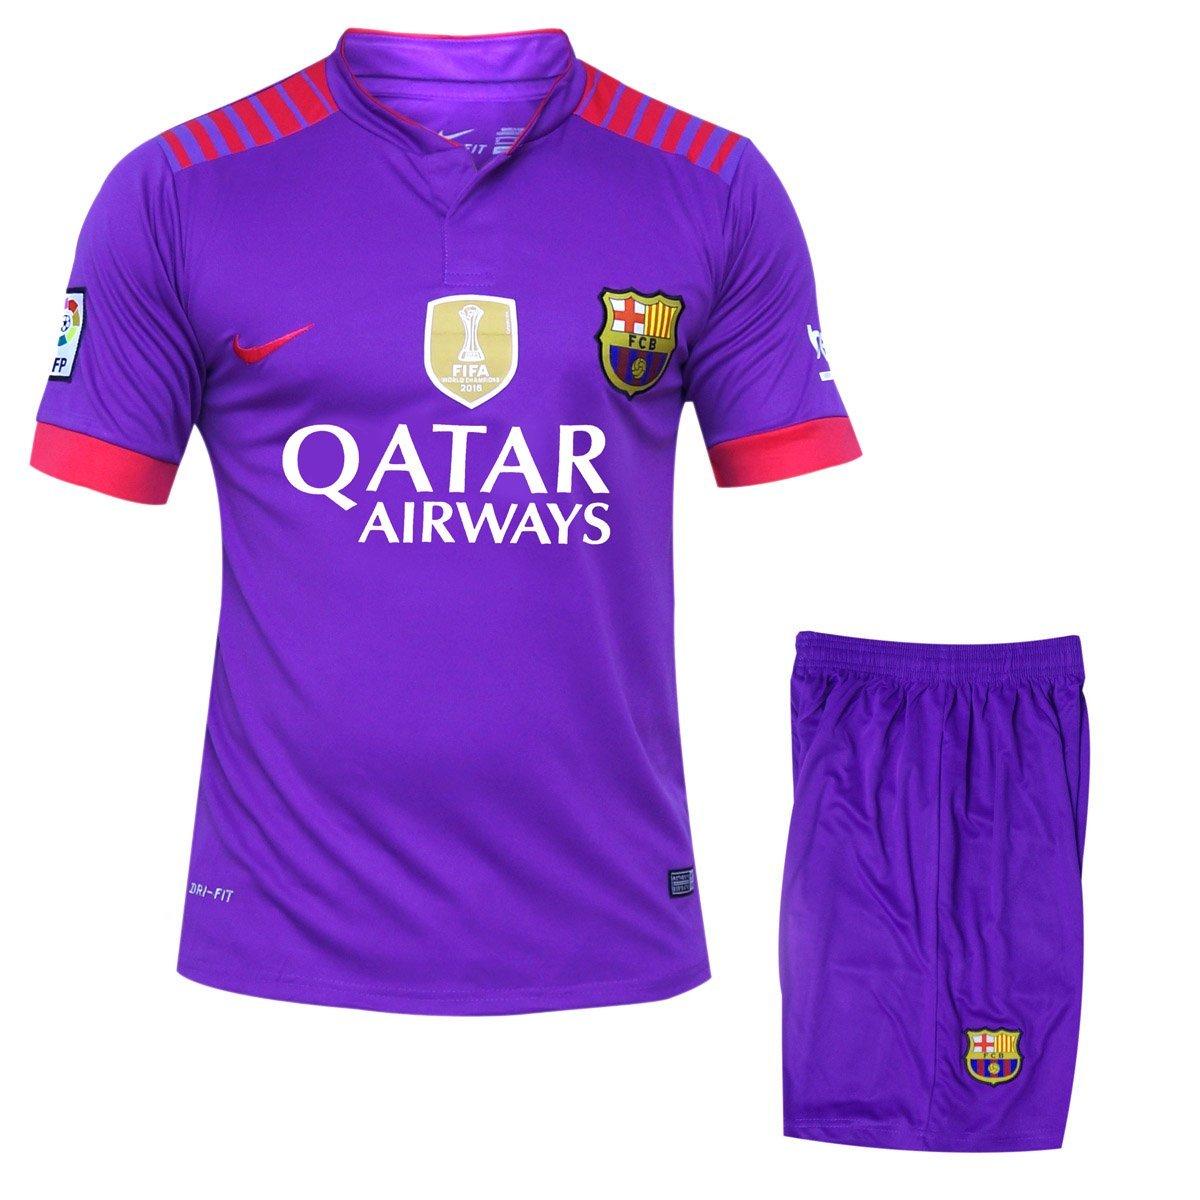 premium selection 580d6 2cc02 Buy Barcelona Fc Football Shirt Kit Hanging Car Air ...